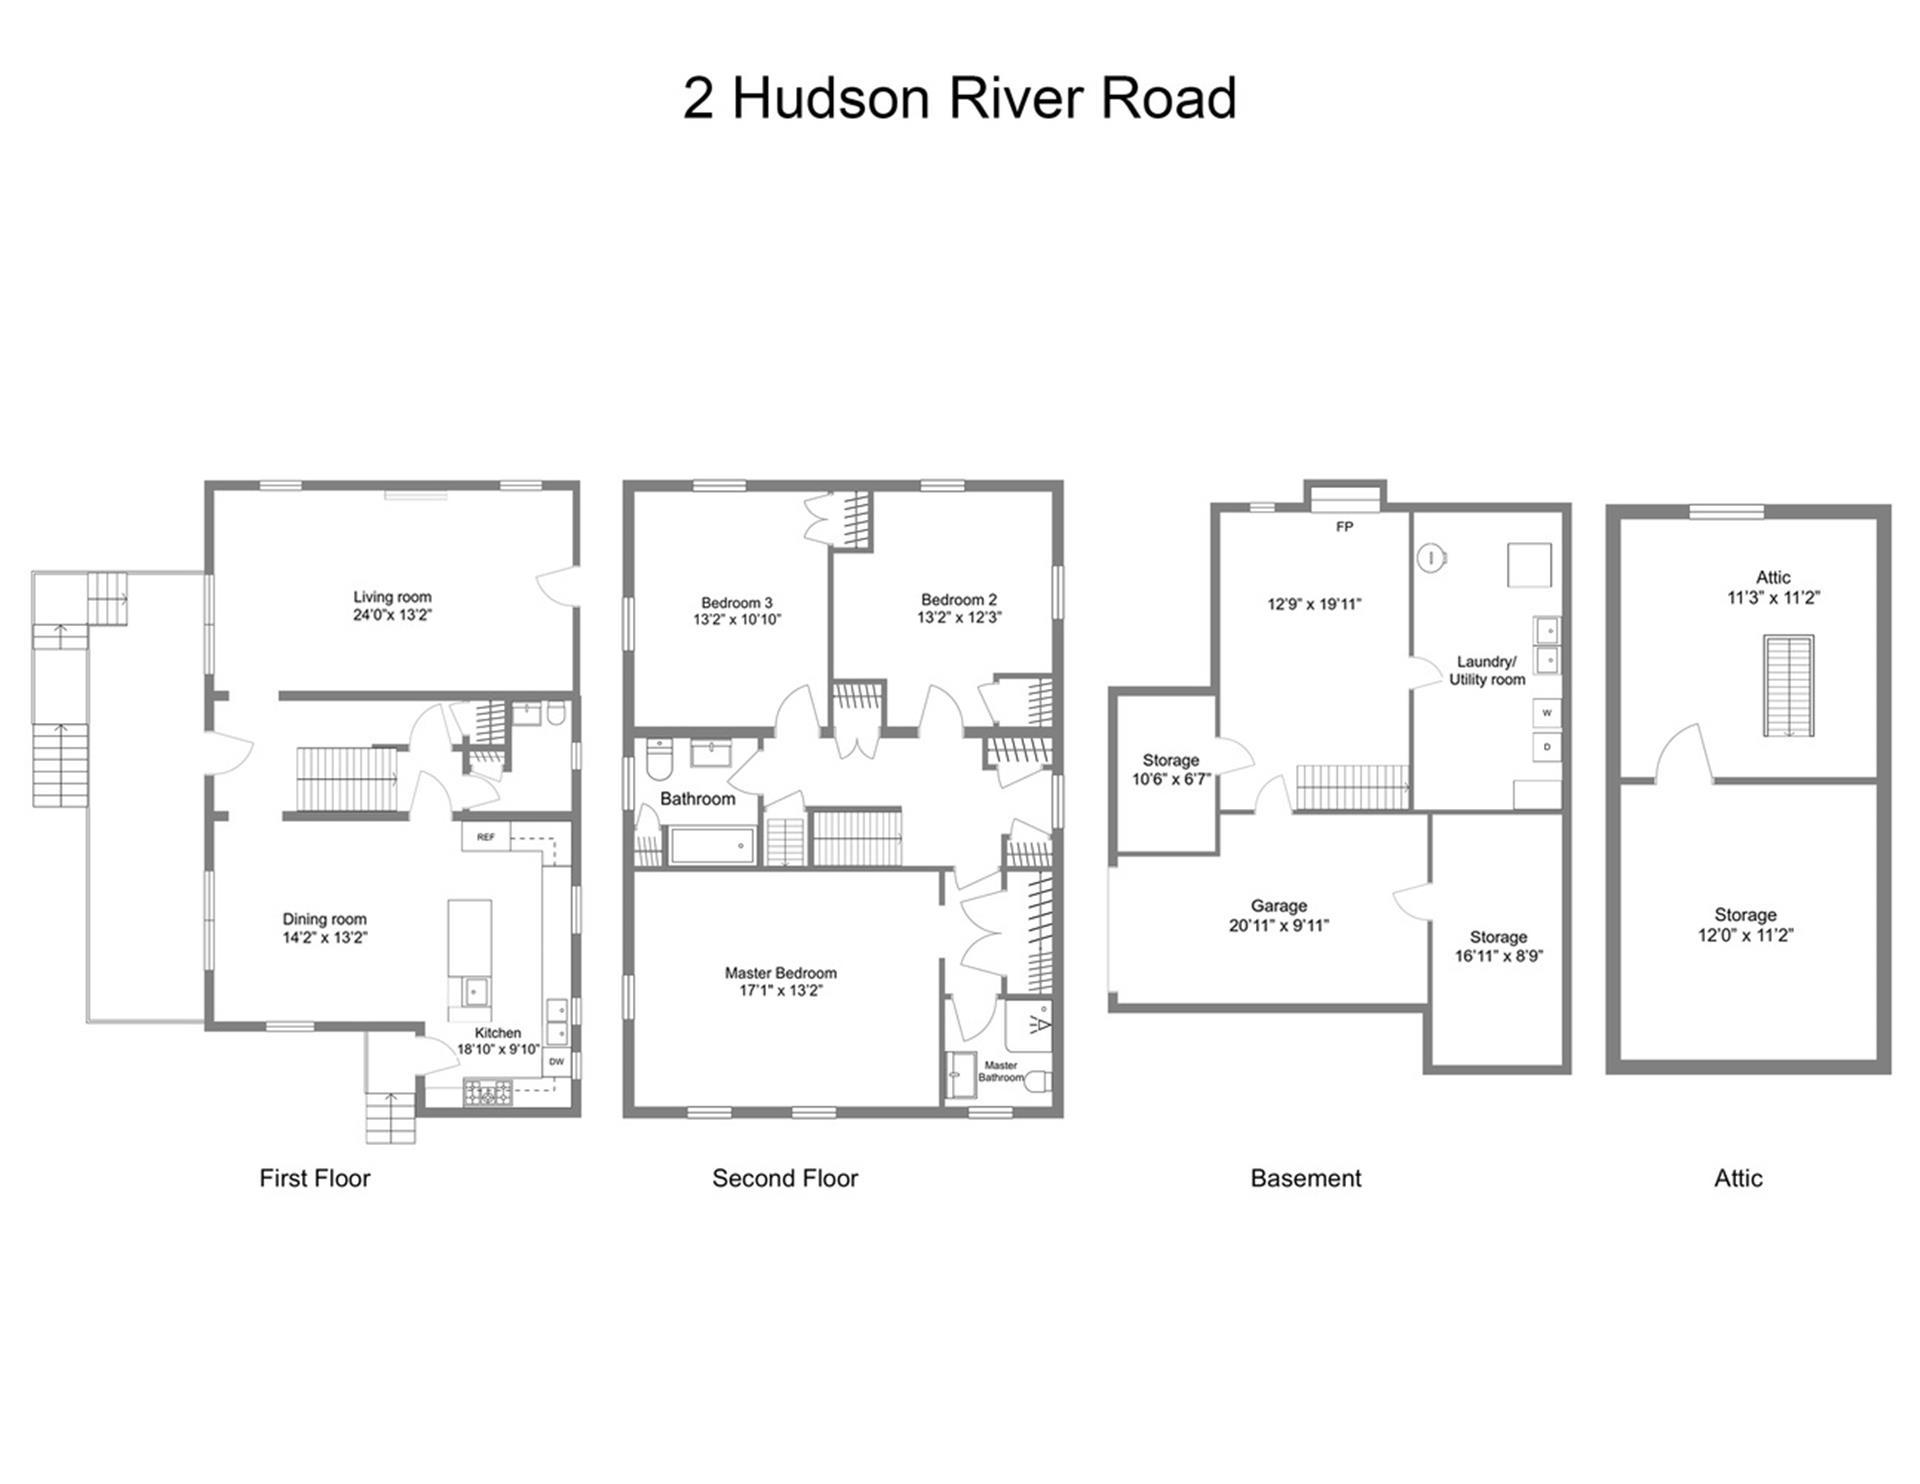 Floor plan of 2 Hudson River Rd - North Riverdale, New York